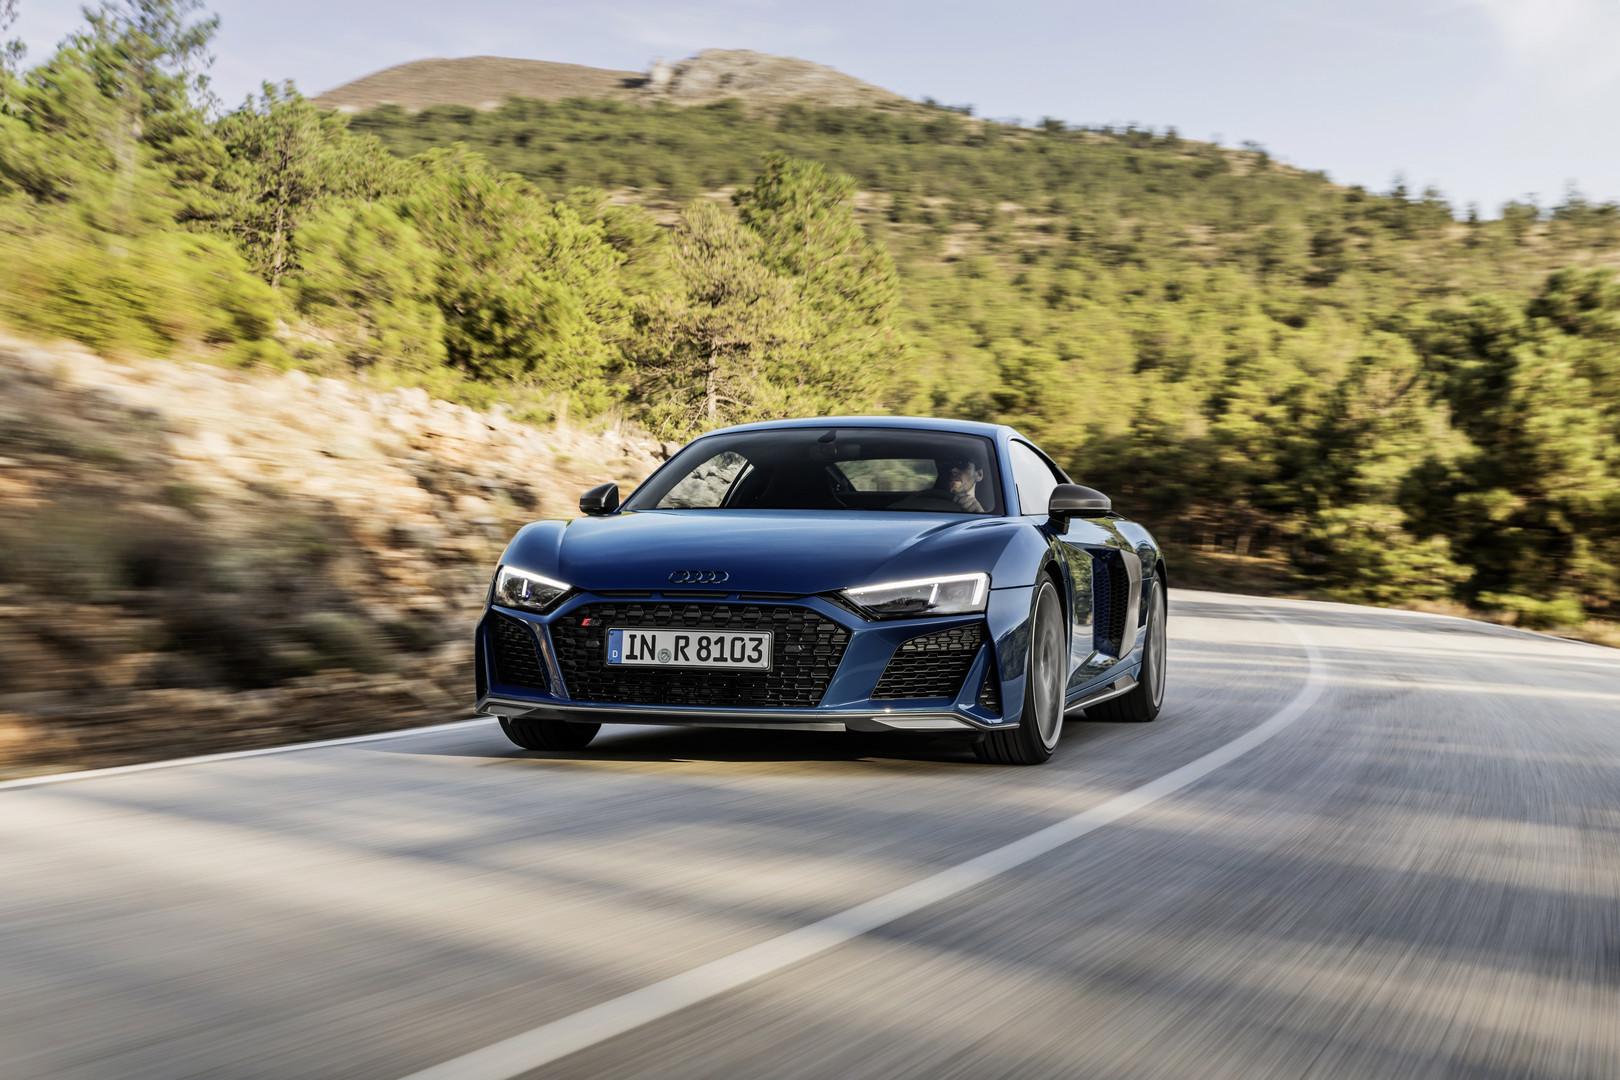 2019 Audi R8 Coupe